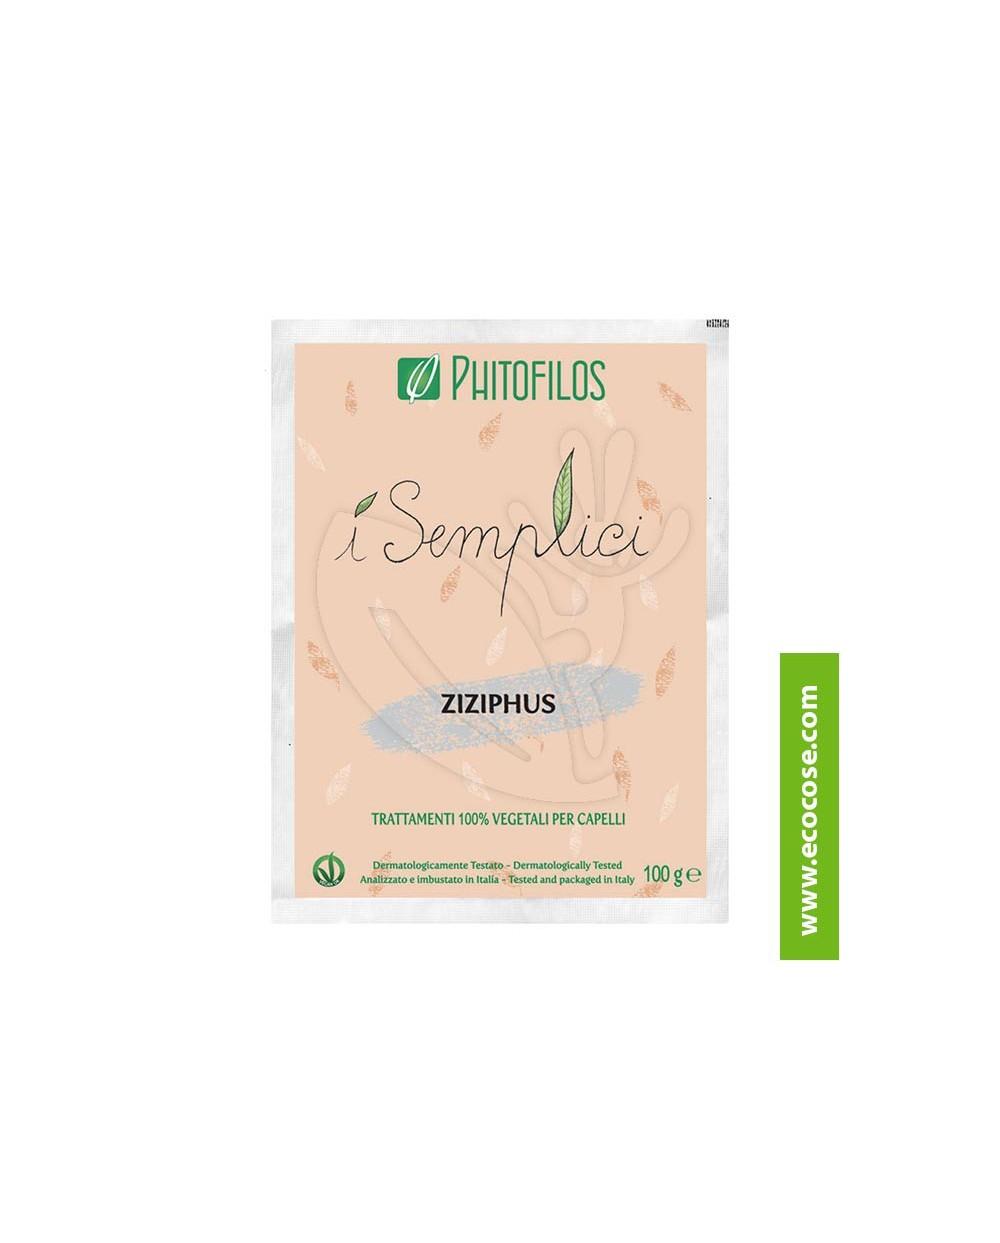 Phitofilos - I semplici - Ziziphus